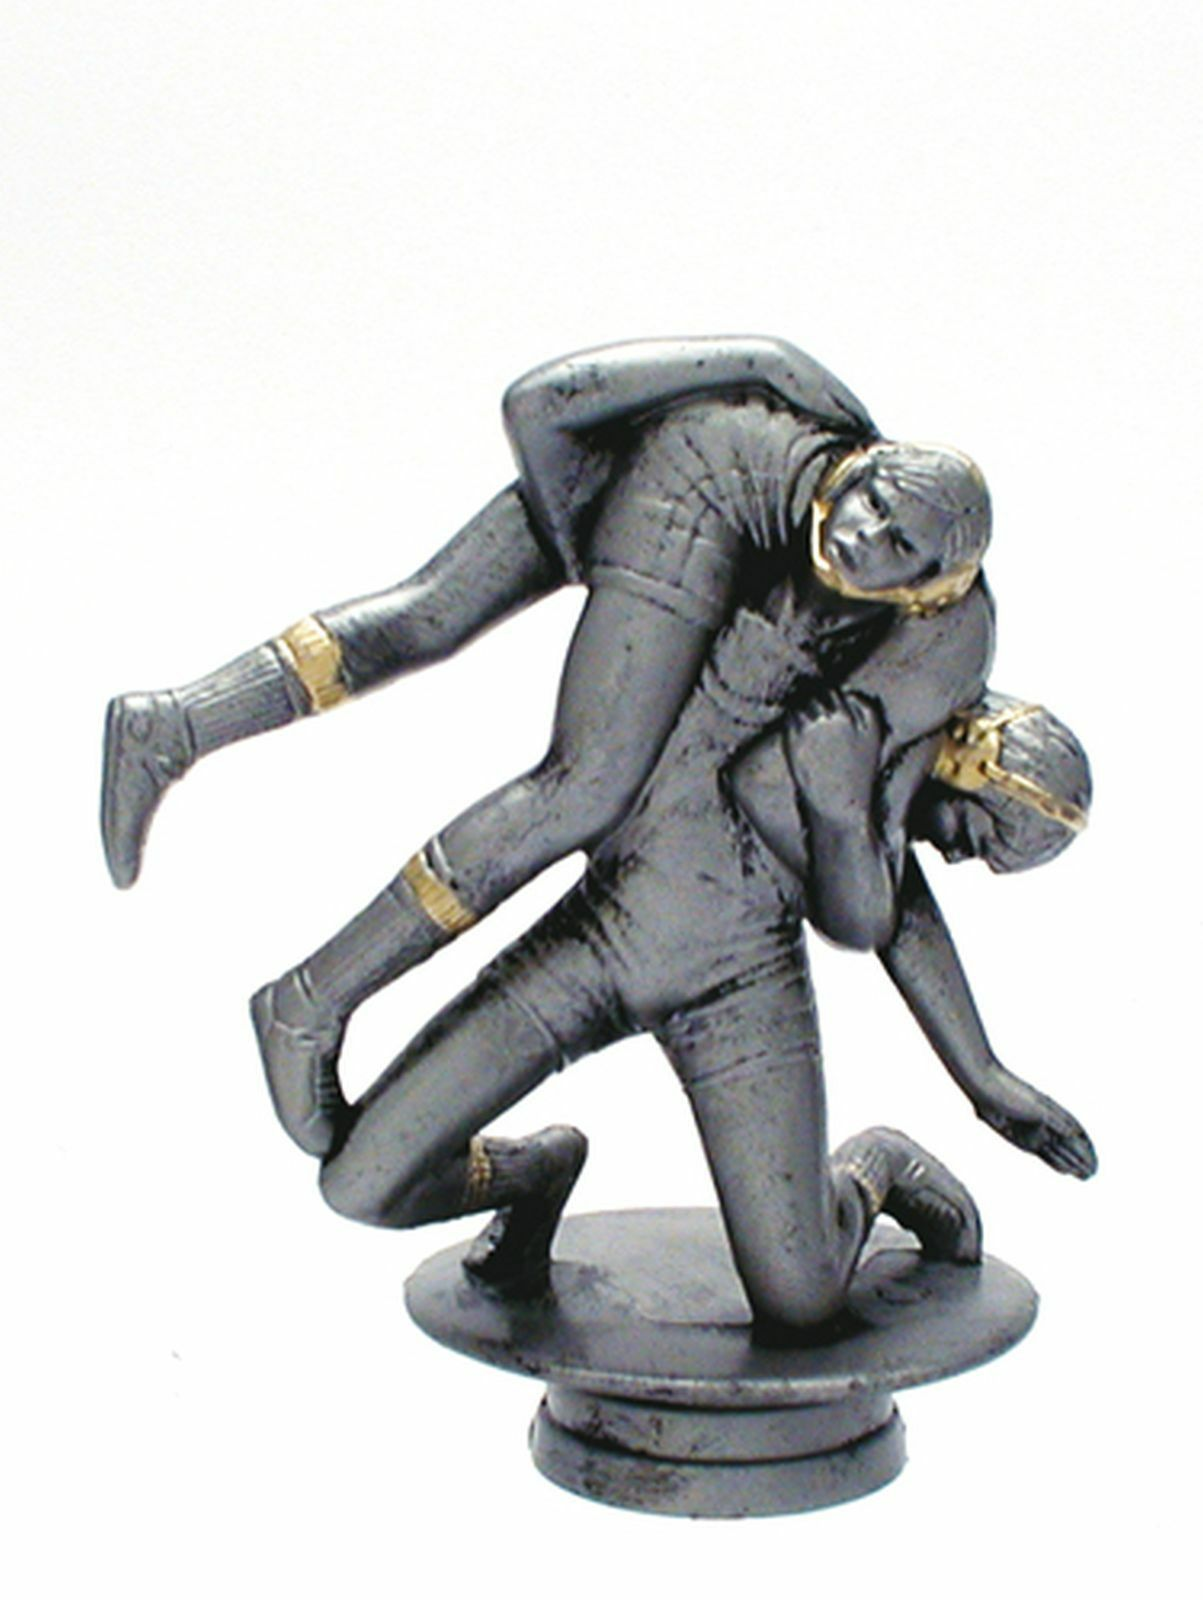 12 Ringen Figuren 3D mit Marmor    1  (Pokale Kampfsport Medaillen Wettkampf) f32dae